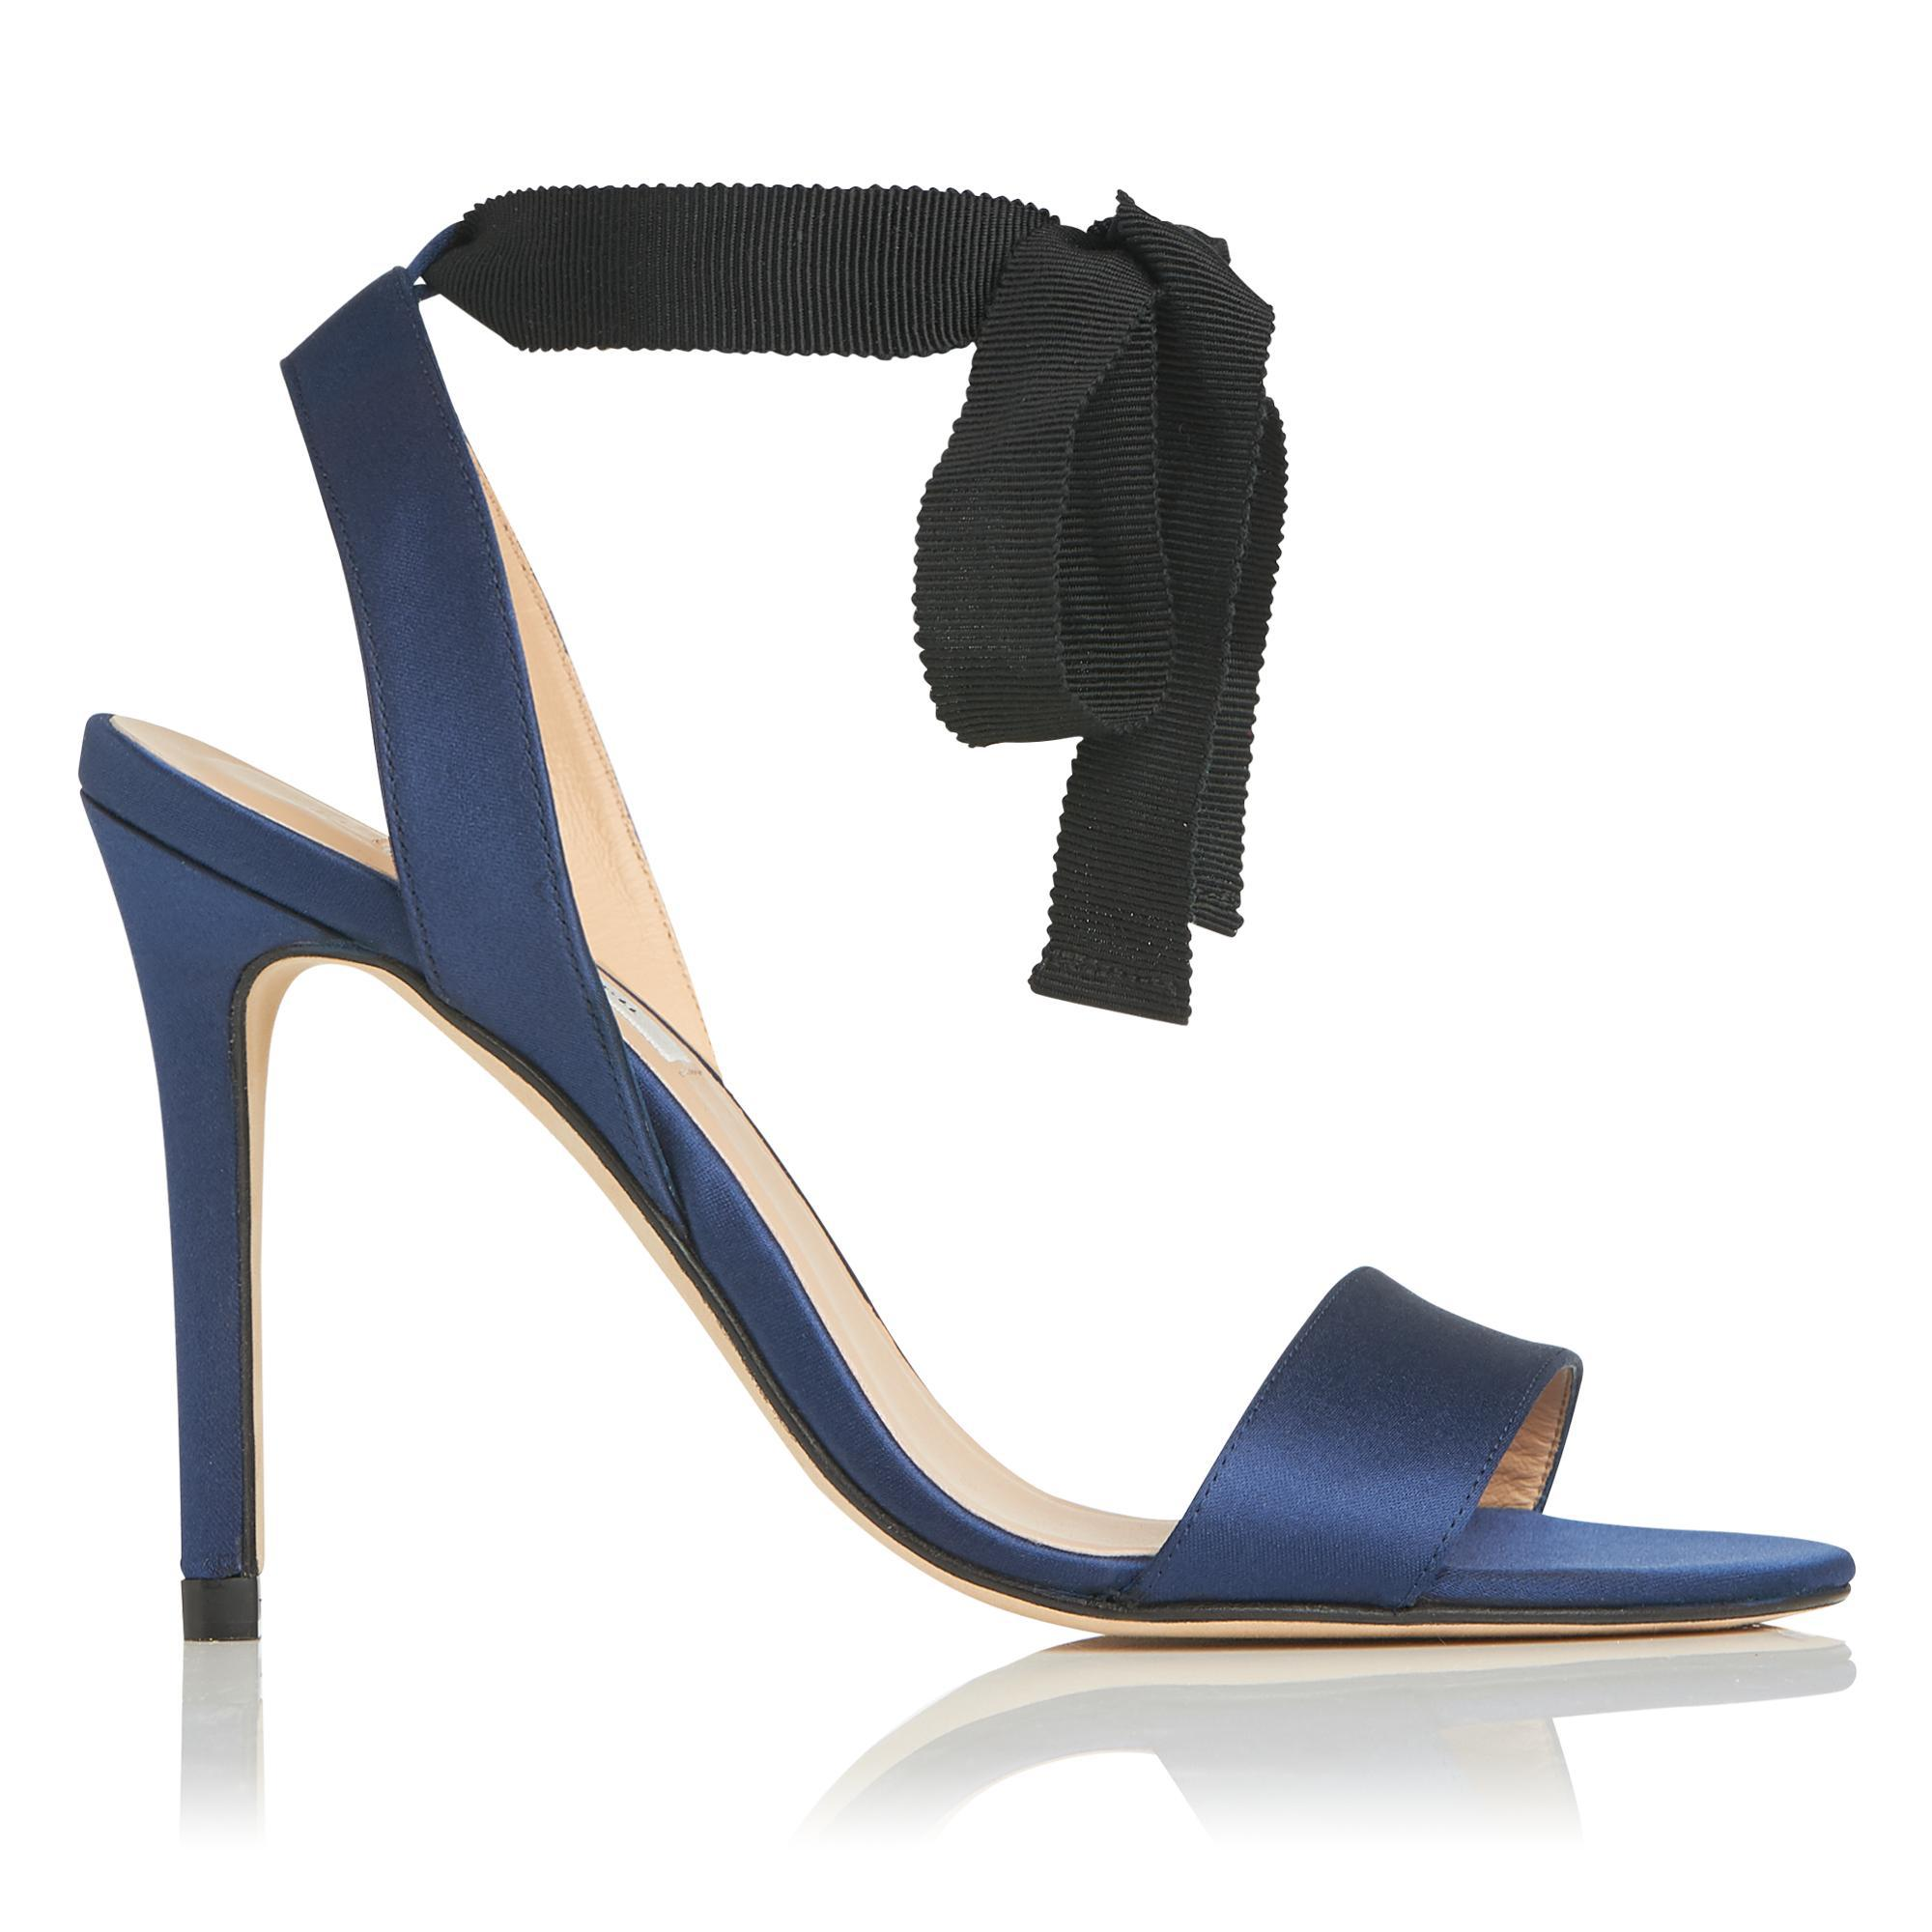 abafe2831189 L.K.Bennett Helia Navy Black Satin Sandals in Blue - Lyst